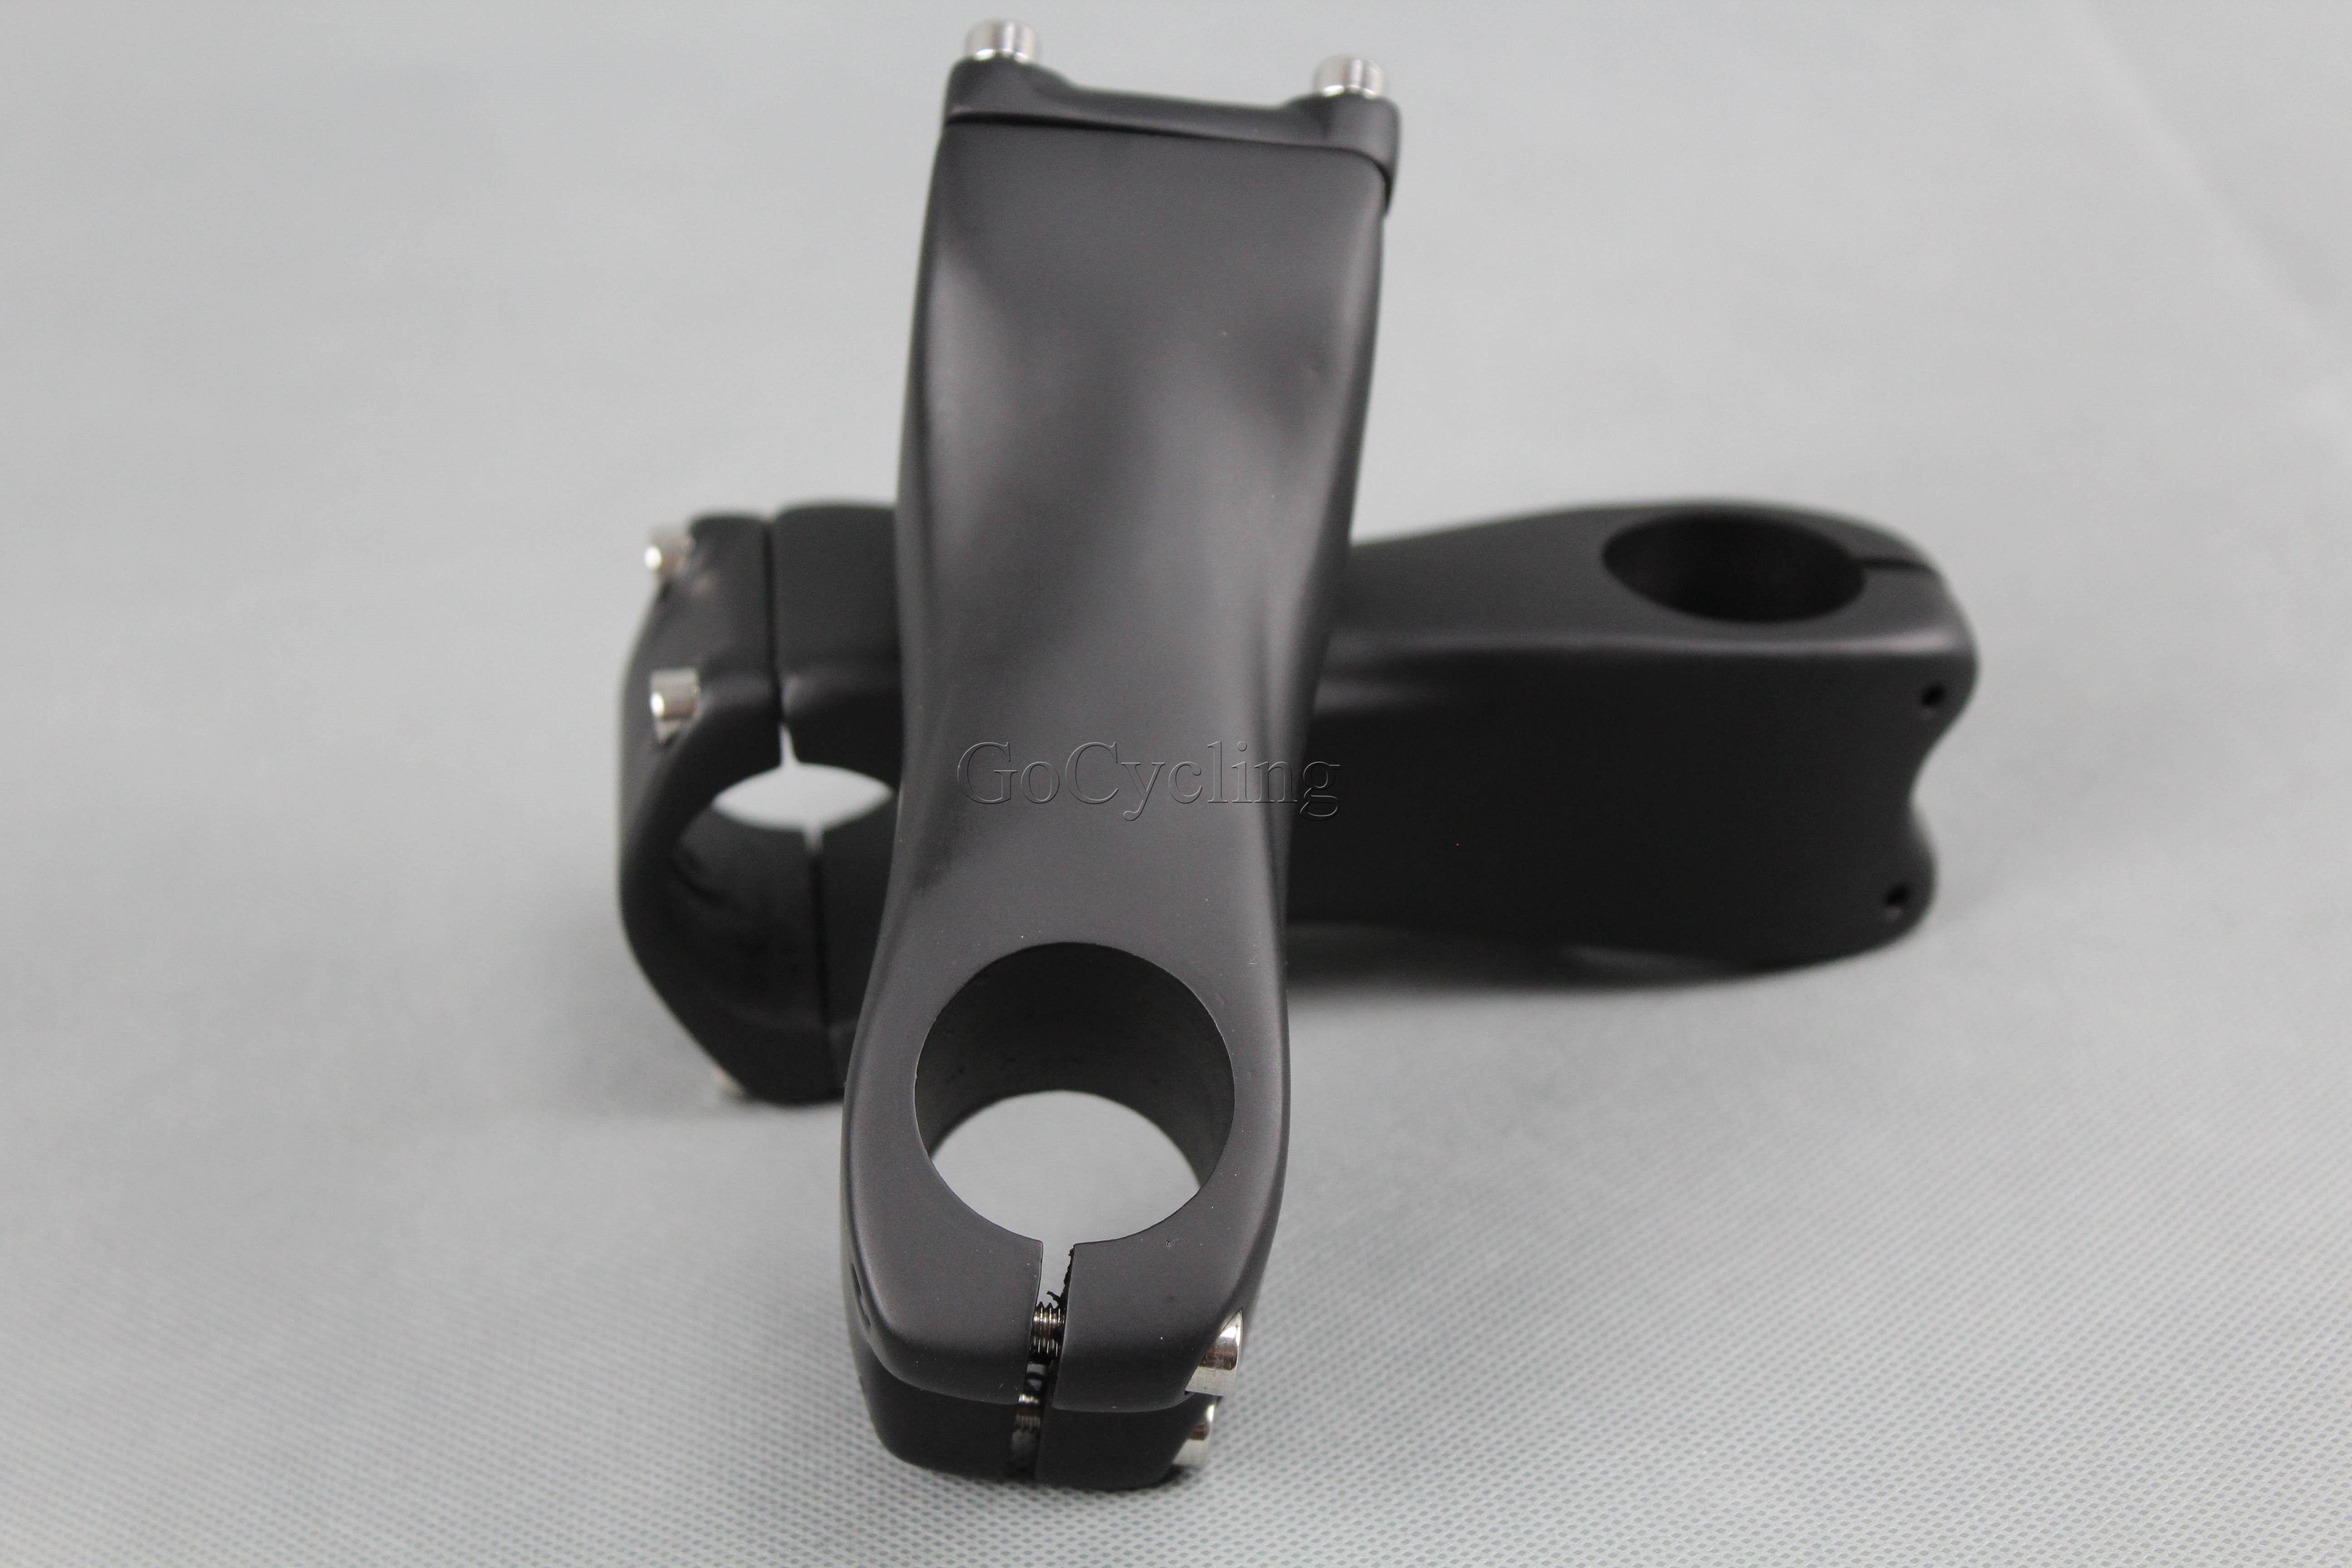 MTB Road Bike carbono tronco haste de fibra de carbono riser 31.8mm tamanhos 90 100 110 120 130mm ângulo 6